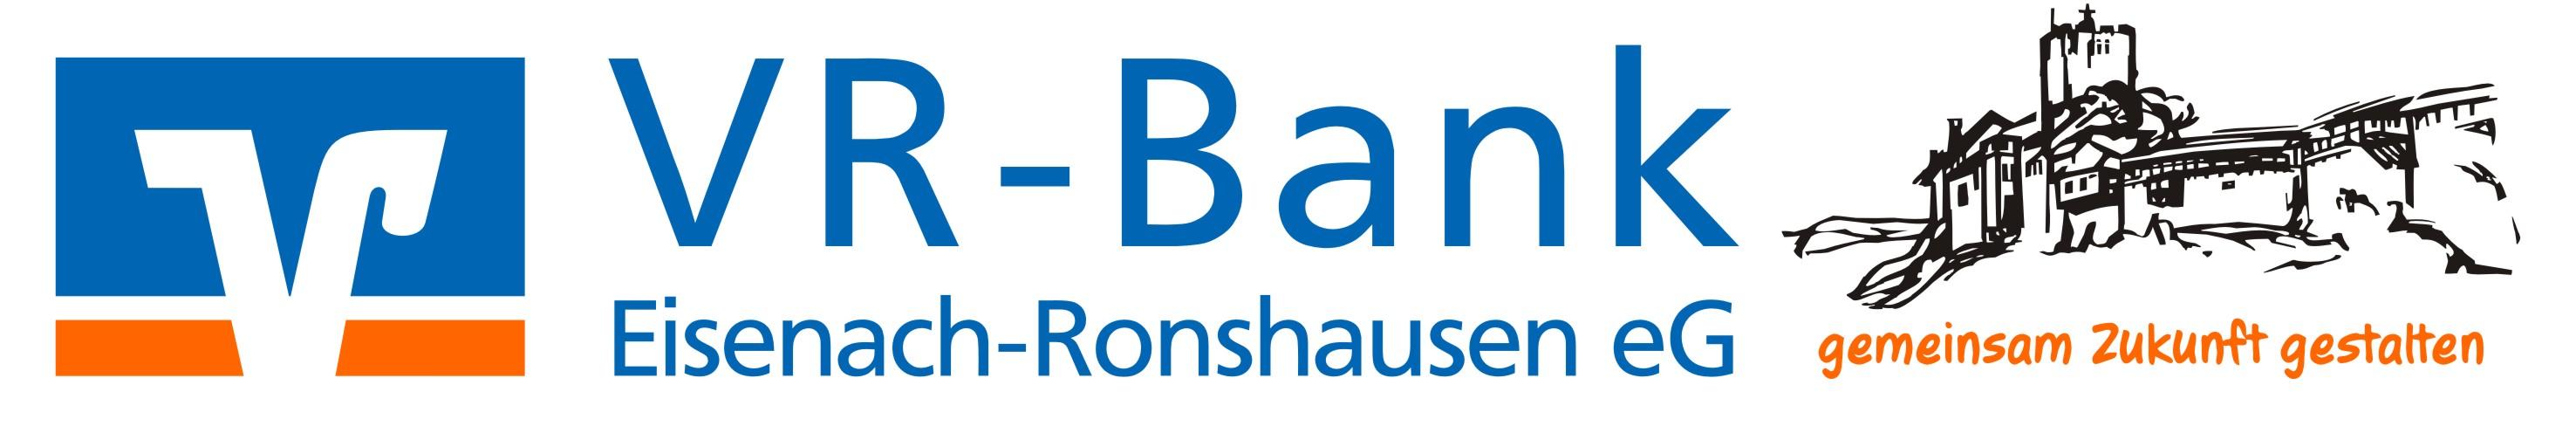 Vr Bank Eisenach Ronshausen